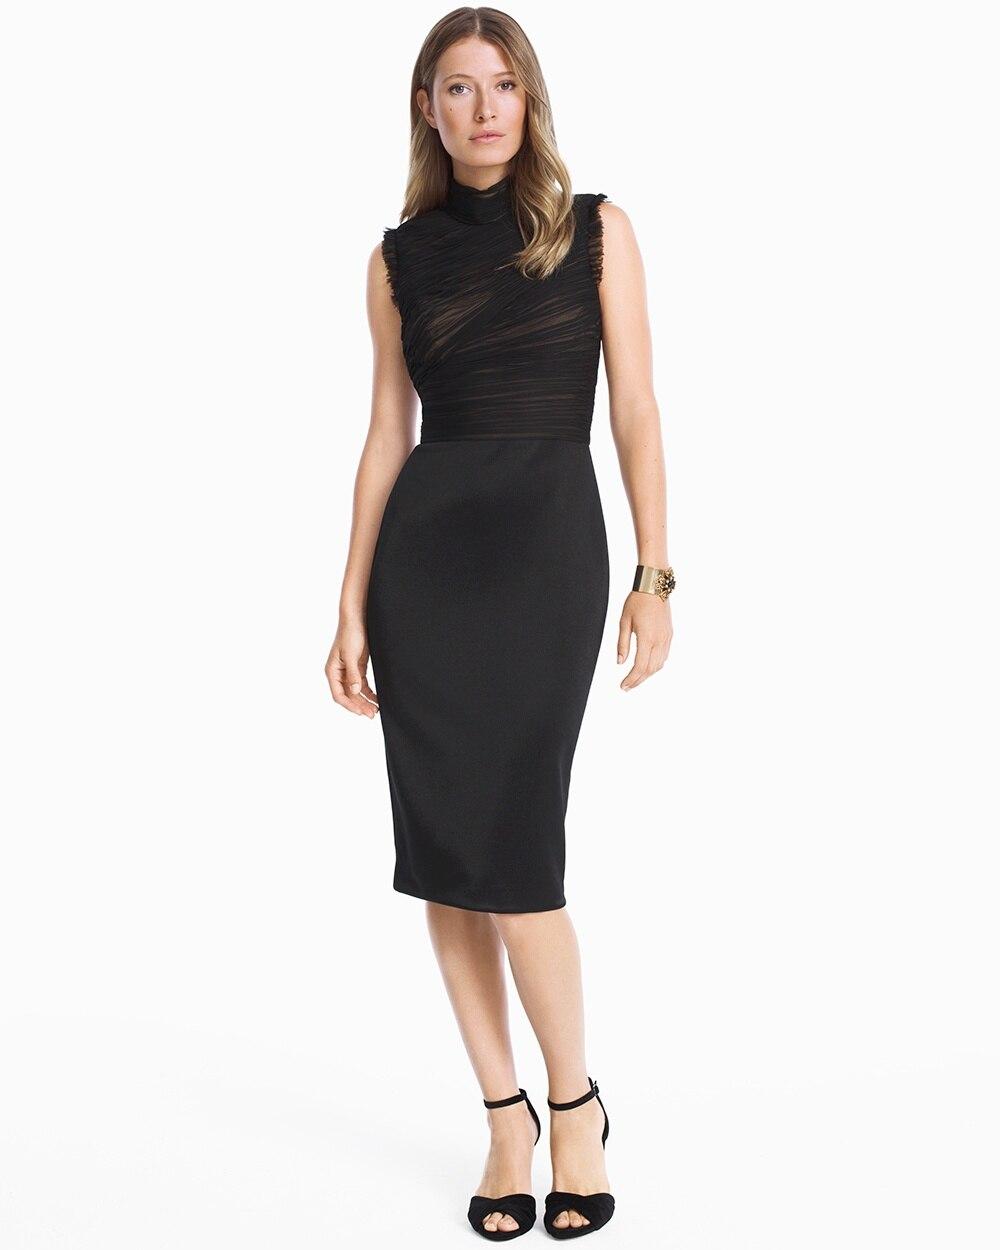 deb3b4df Mock Neck Black Ruched Sheath Dress - White House Black Market